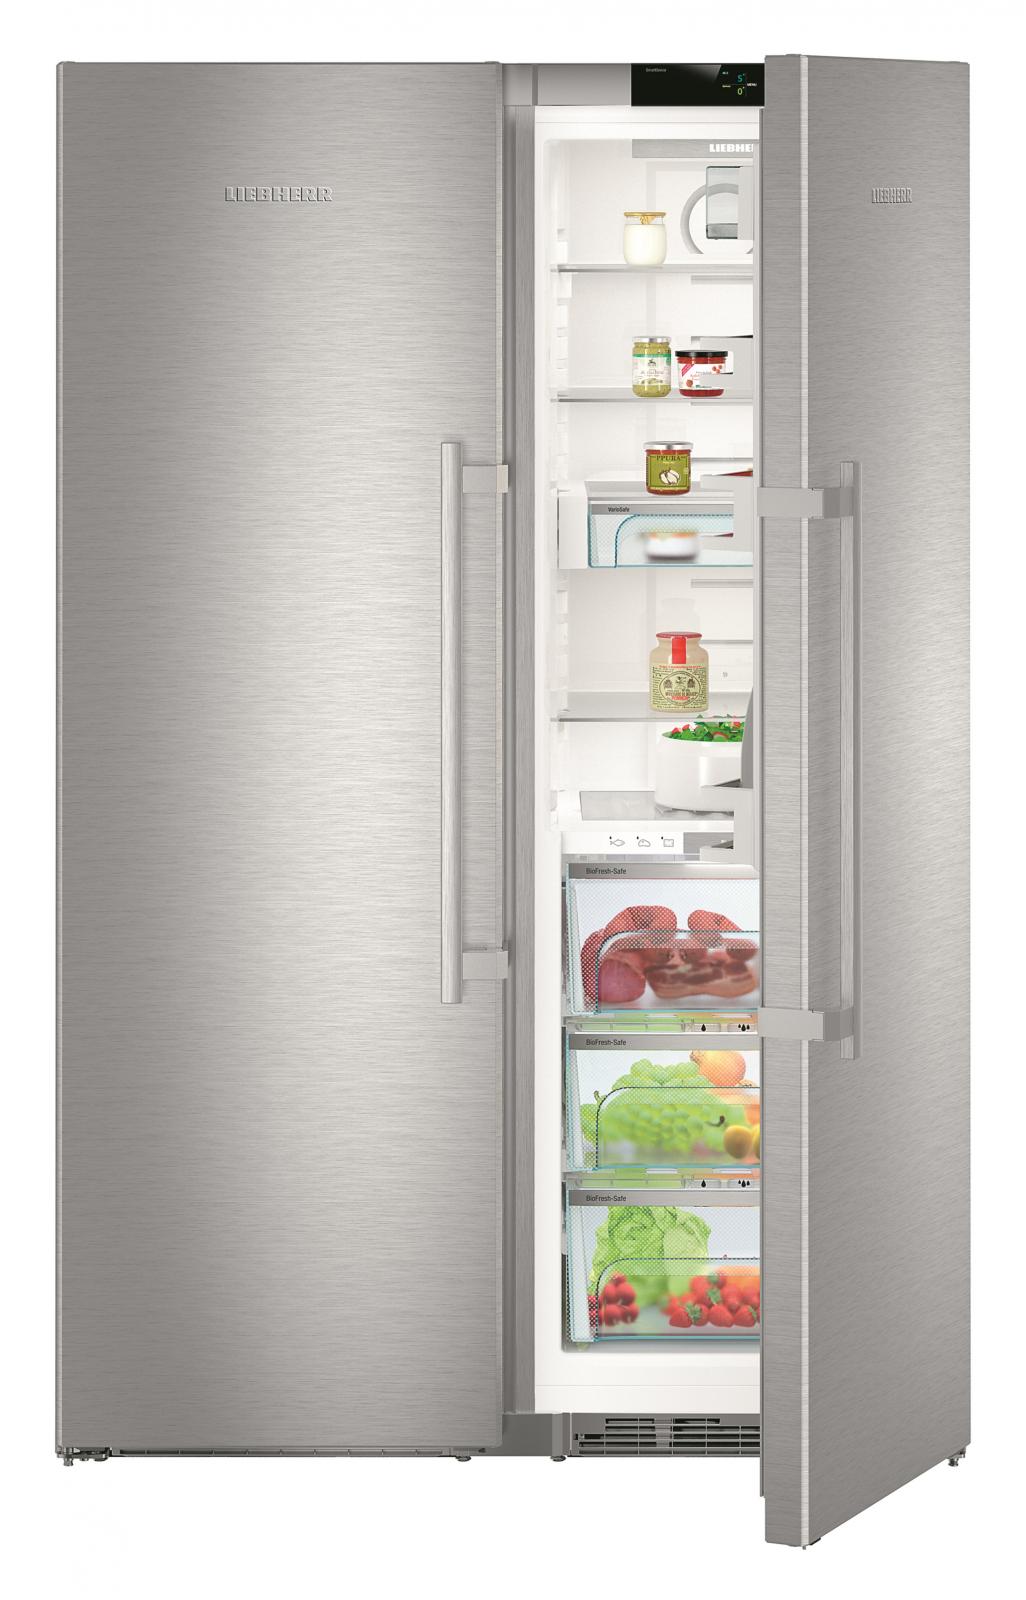 купить Side-by-Side холодильник Liebherr SBSes 8663 Украина фото 3